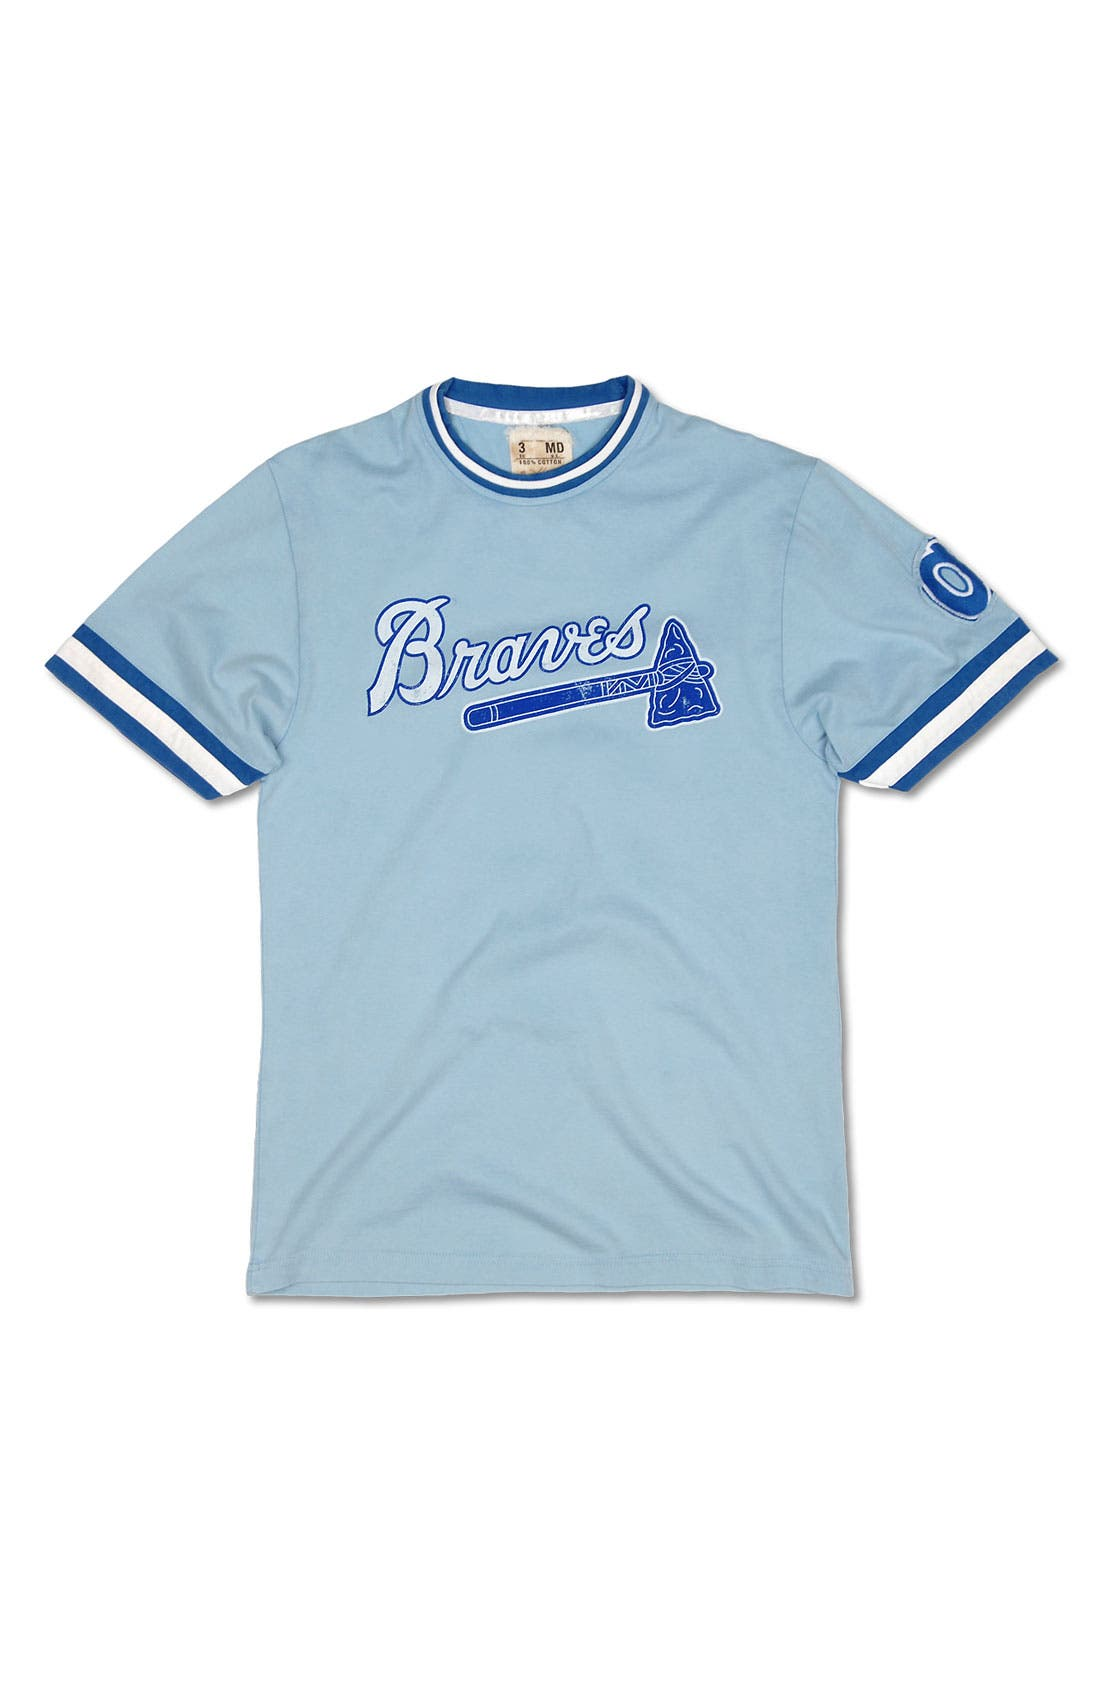 Alternate Image 1 Selected - Red Jacket 'Atlanta Braves' Trim Fit Ringer T-Shirt (Men)